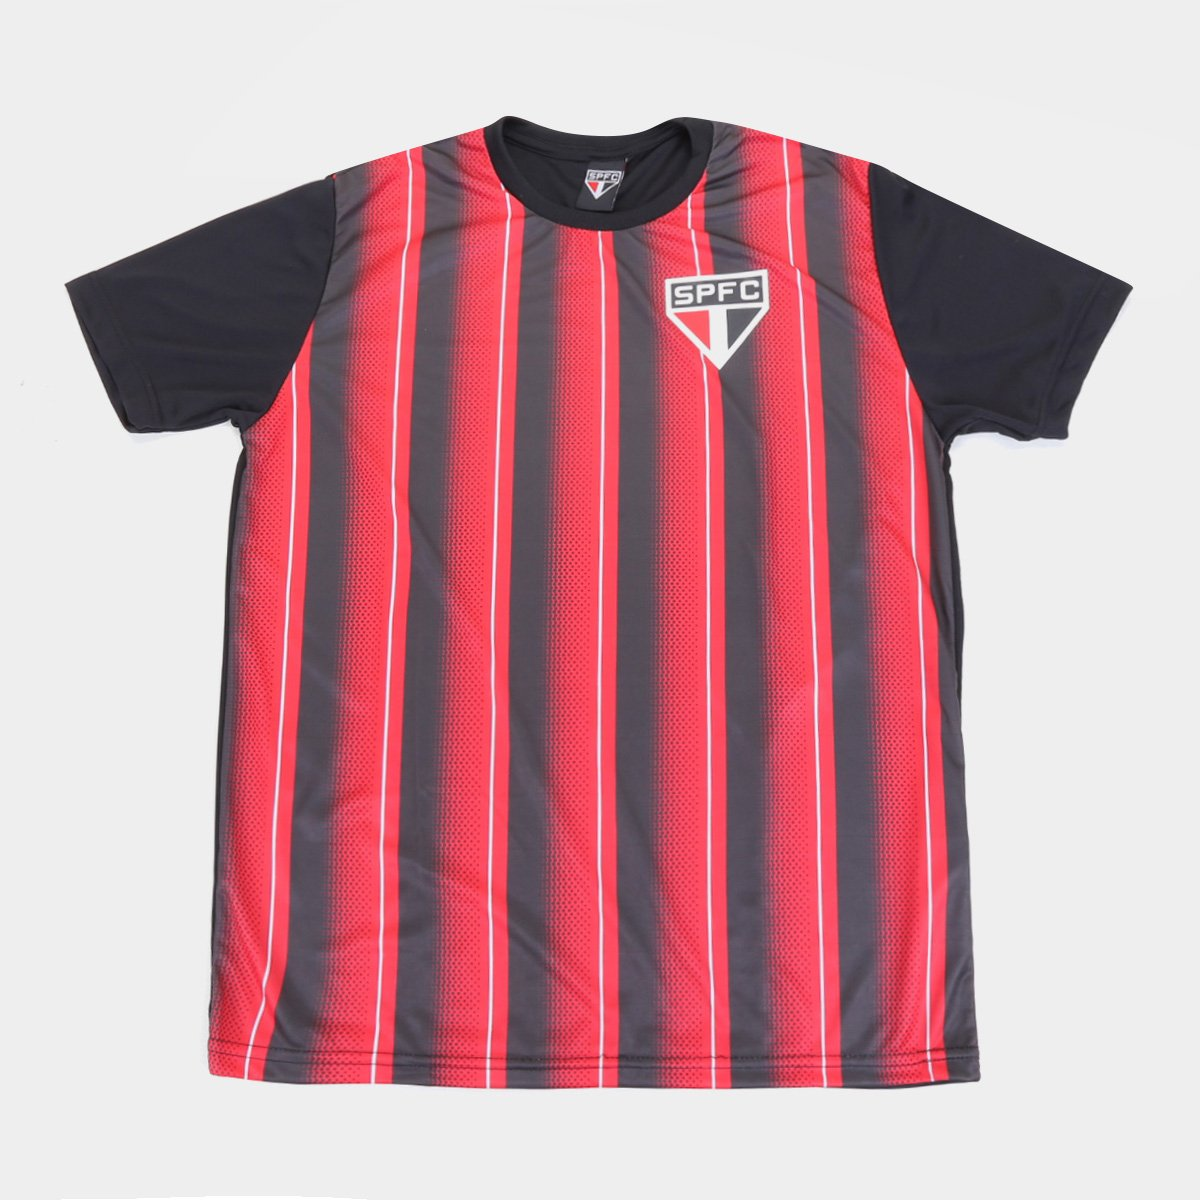 Camisa São Paulo Handley SPR